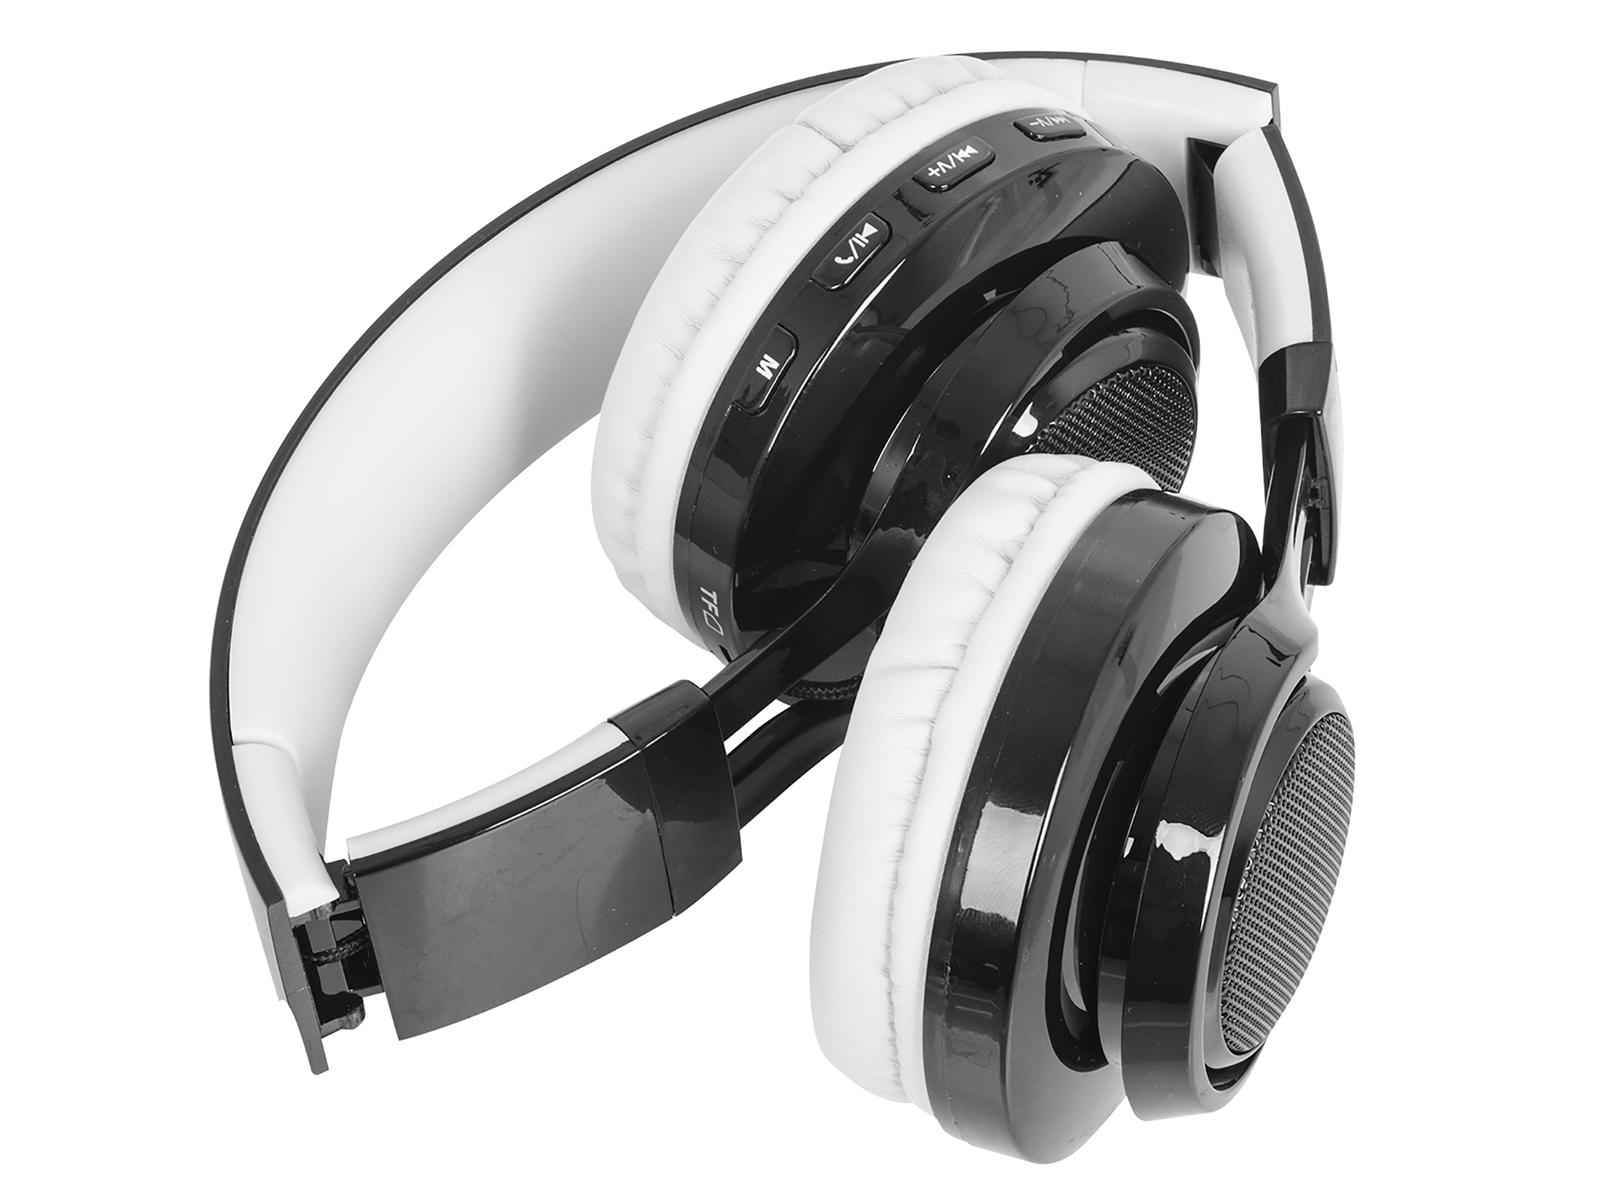 Cuffie Bluetooth con Microfono TREVI DJ 1300 BTR Bianco auricolari headset  headp e180854fab84